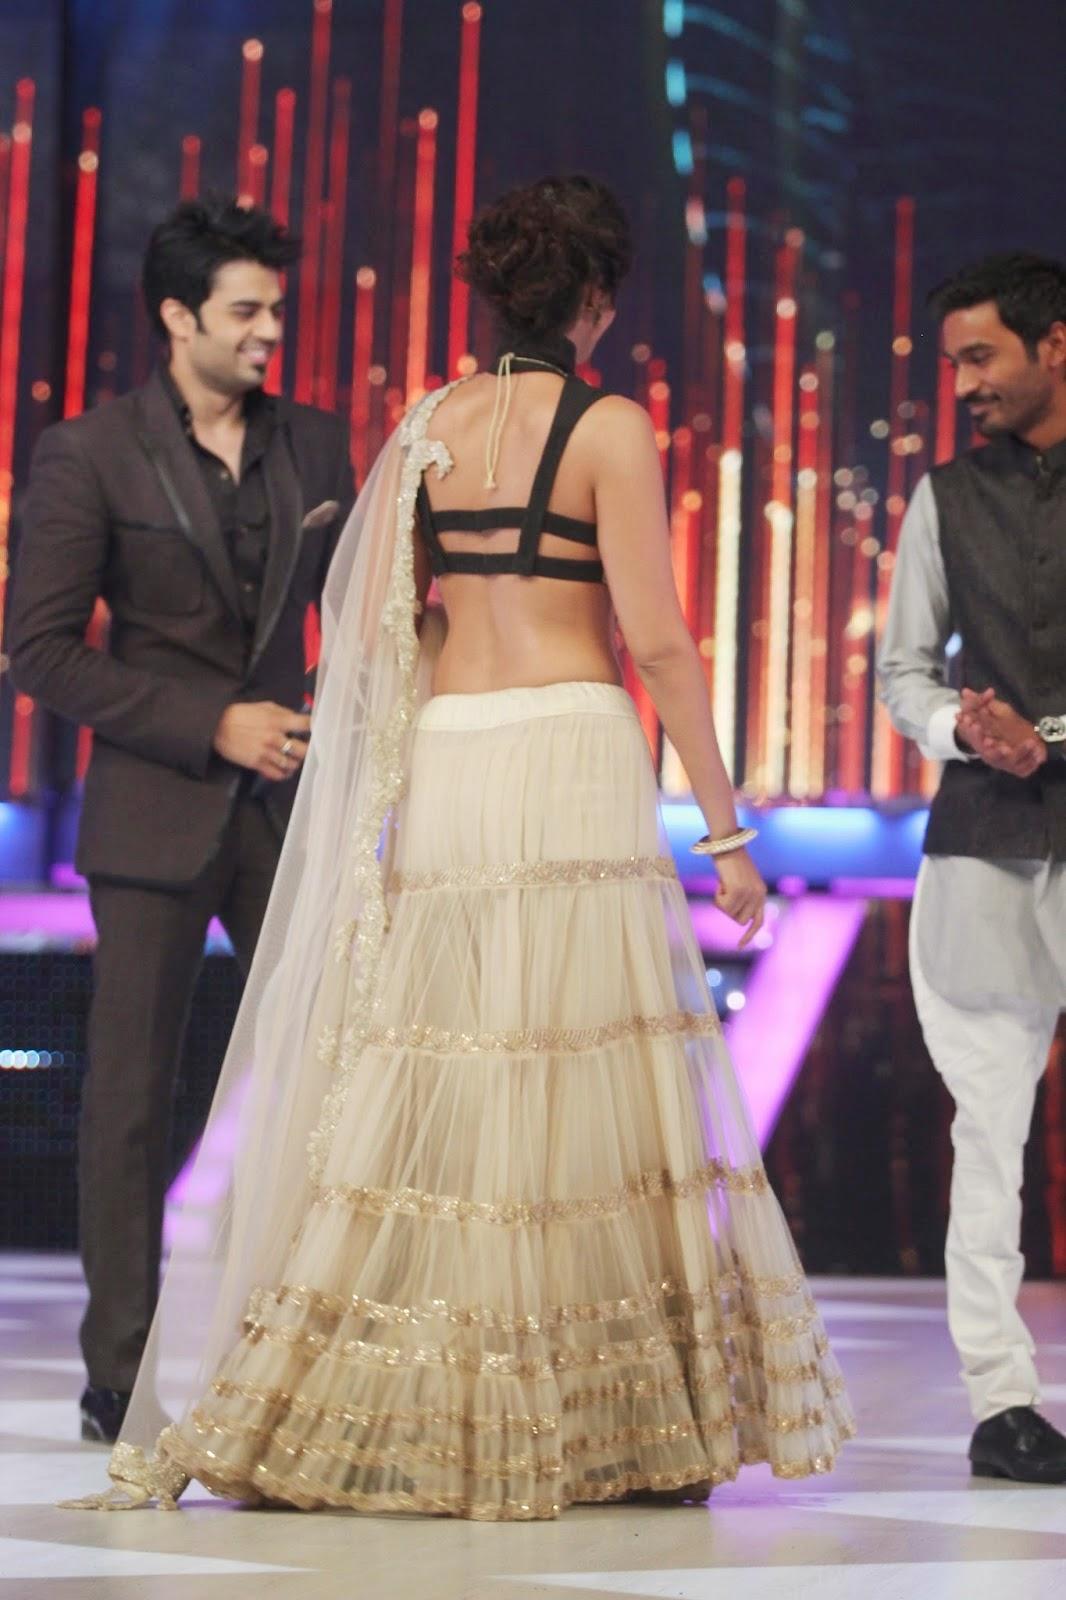 Cleavage Gayatri Patel nudes (56 photos) Paparazzi, Twitter, underwear